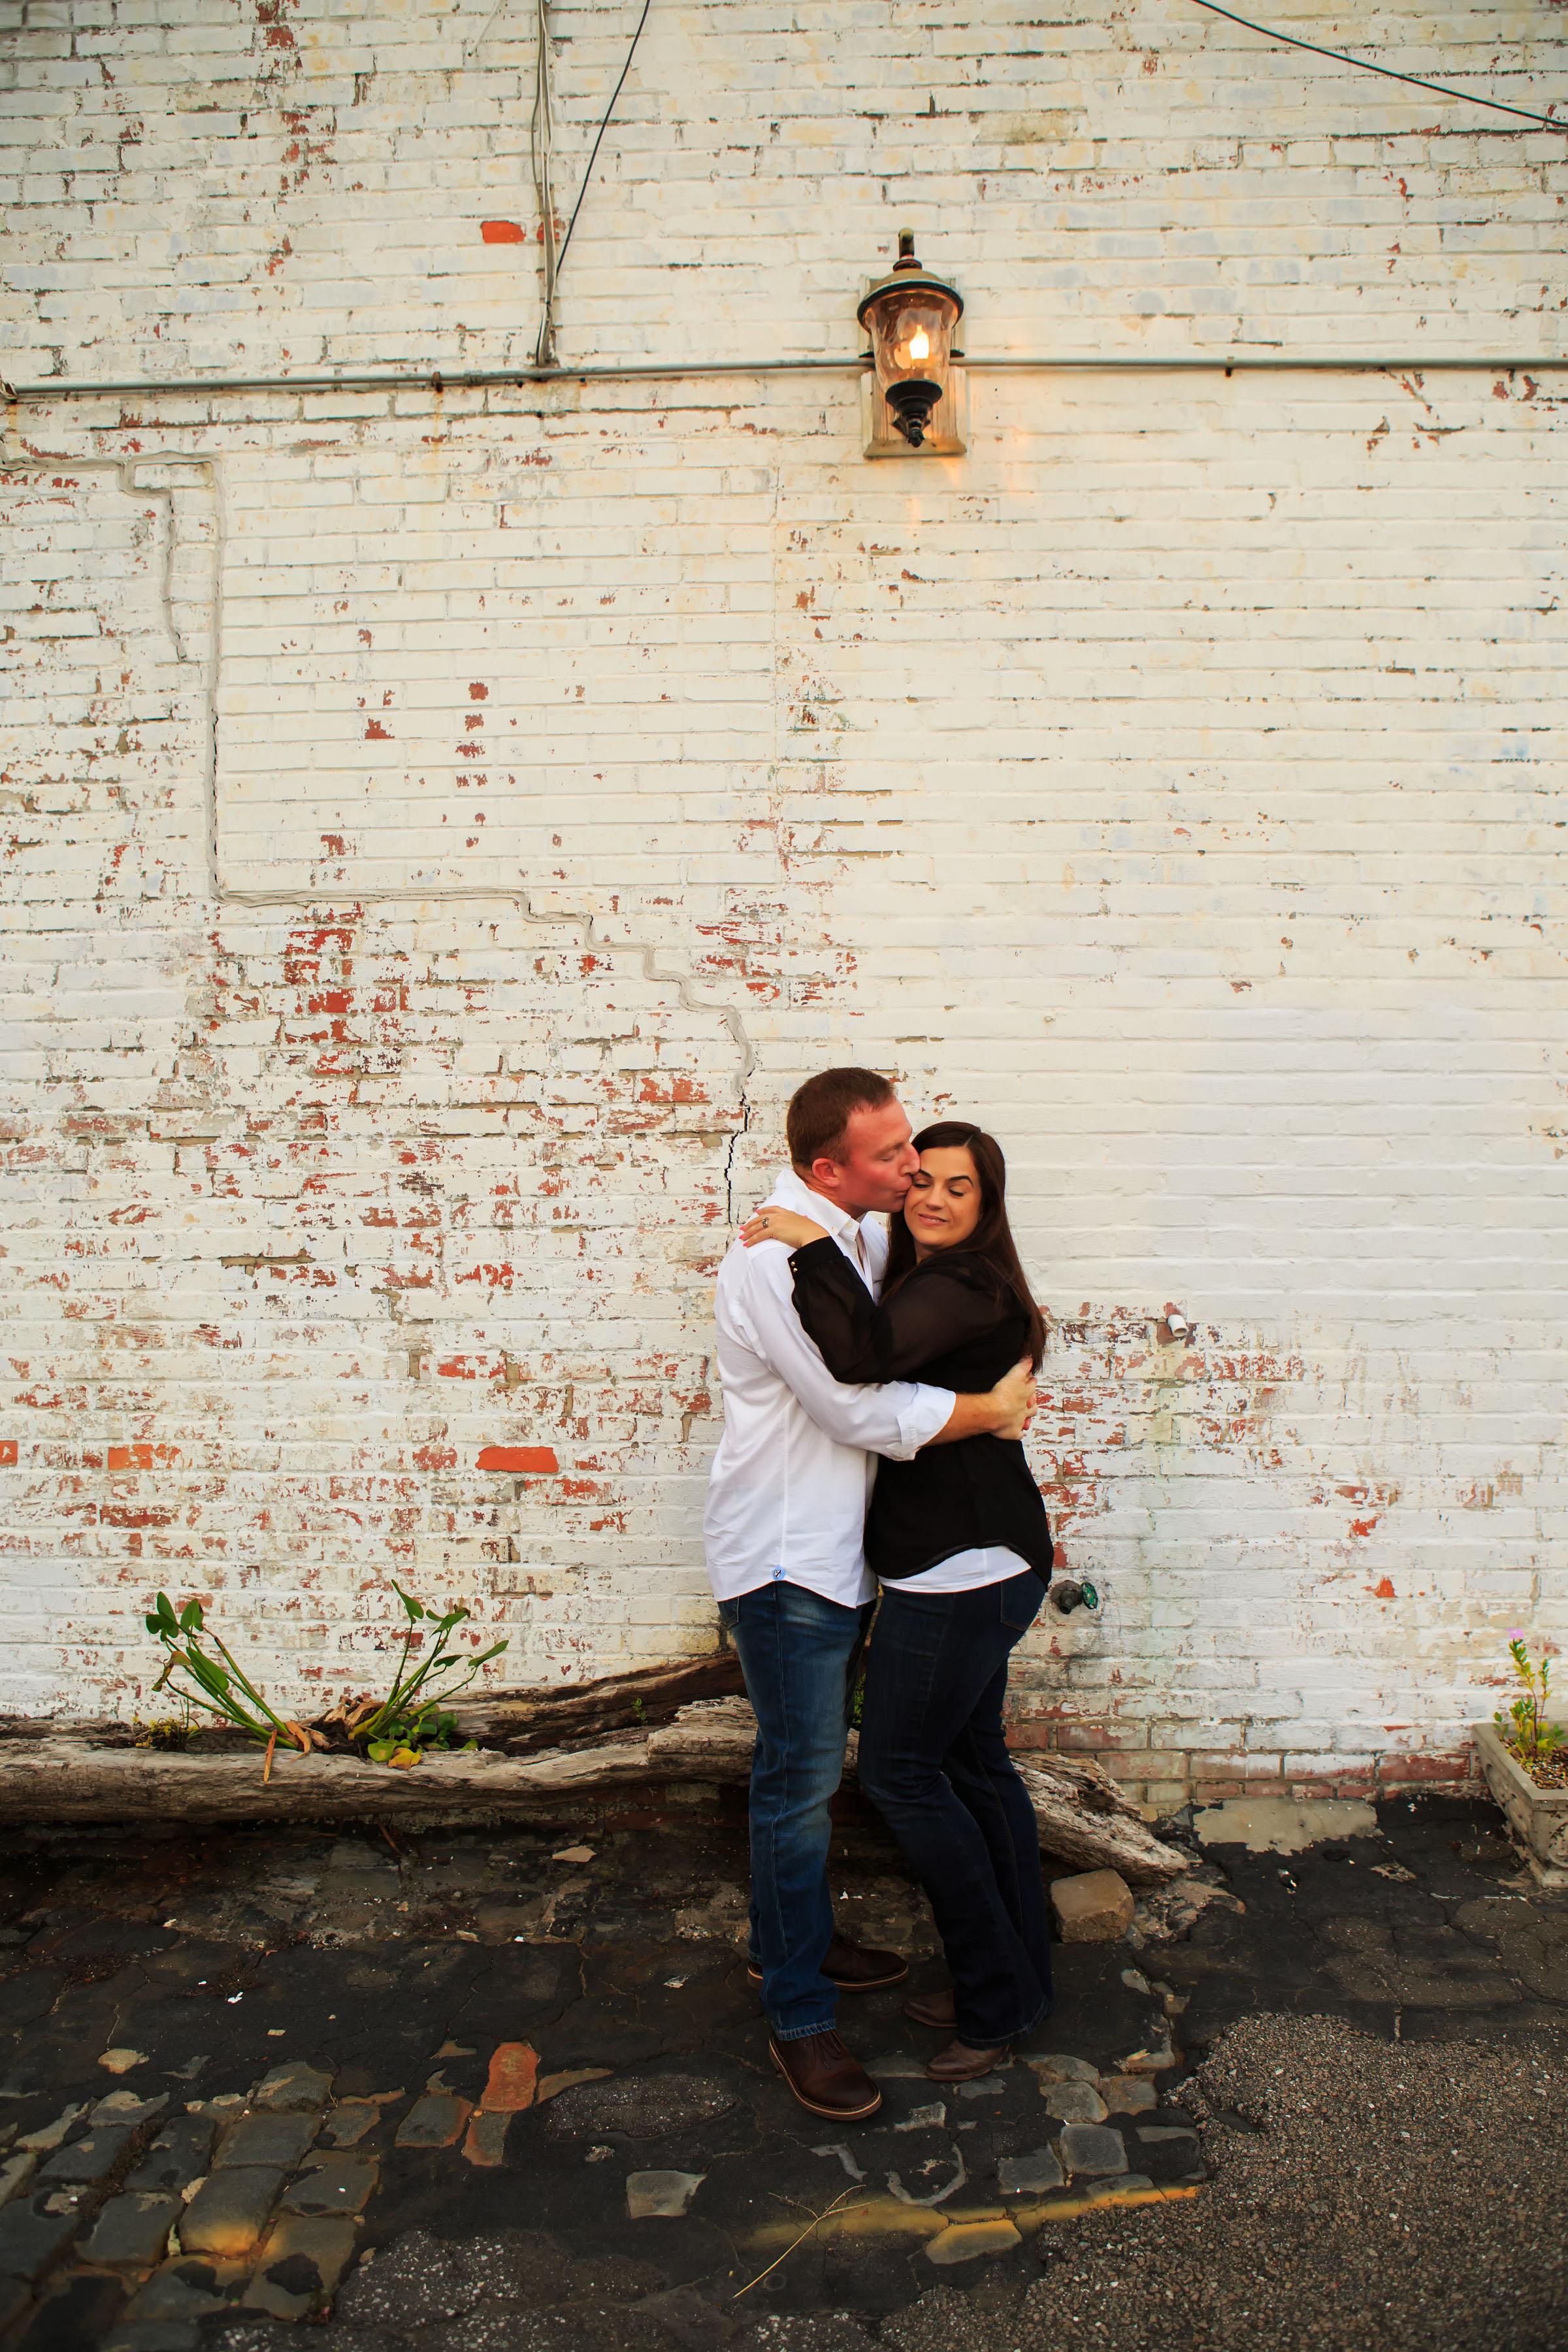 Wilmington_NC_Photographer_Tiffany_Abruzzo_Photography_Engagement_34.jpg